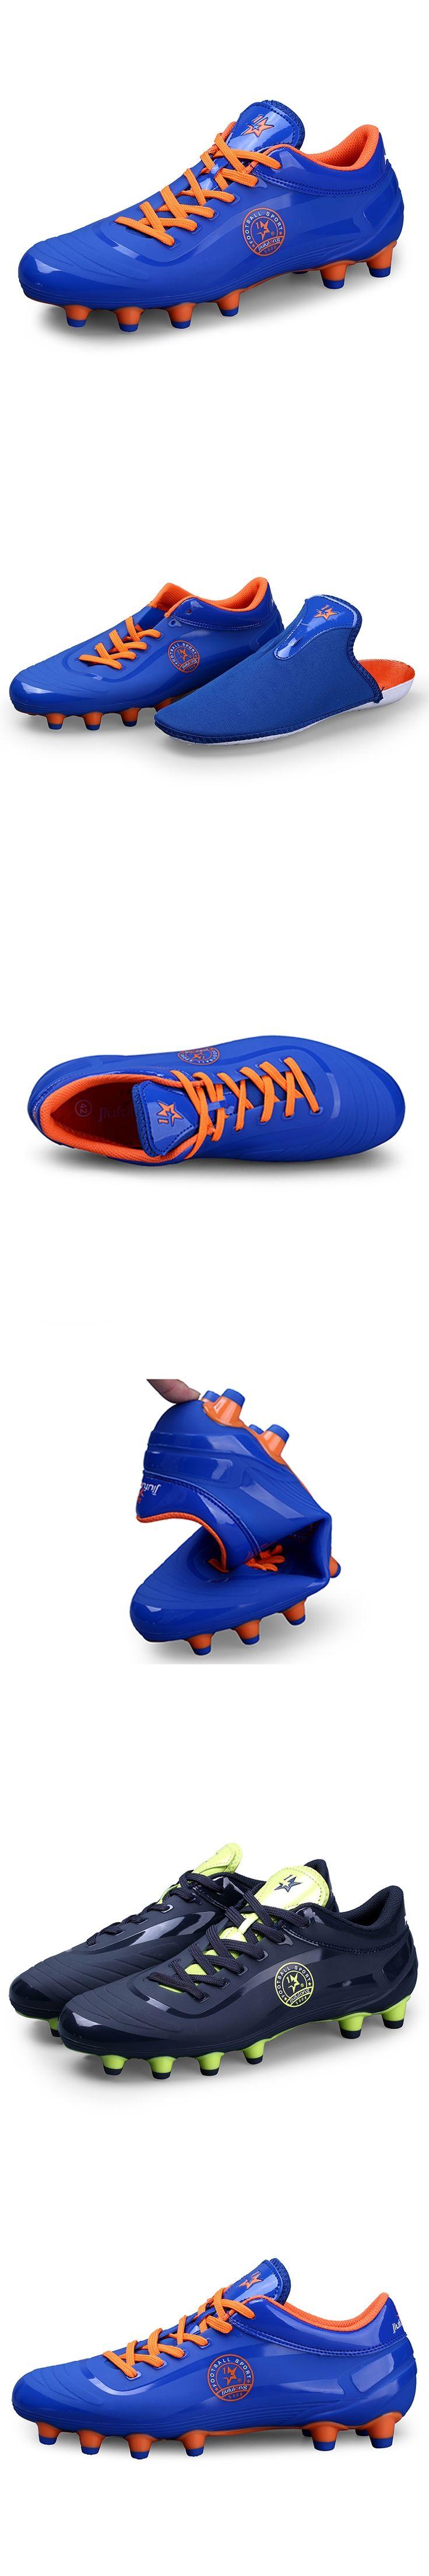 High Quality Professional FG AG Football Boots Kids Children Men Breathable Soccer Shoes Cleats Botas De Futbol Size 33-44